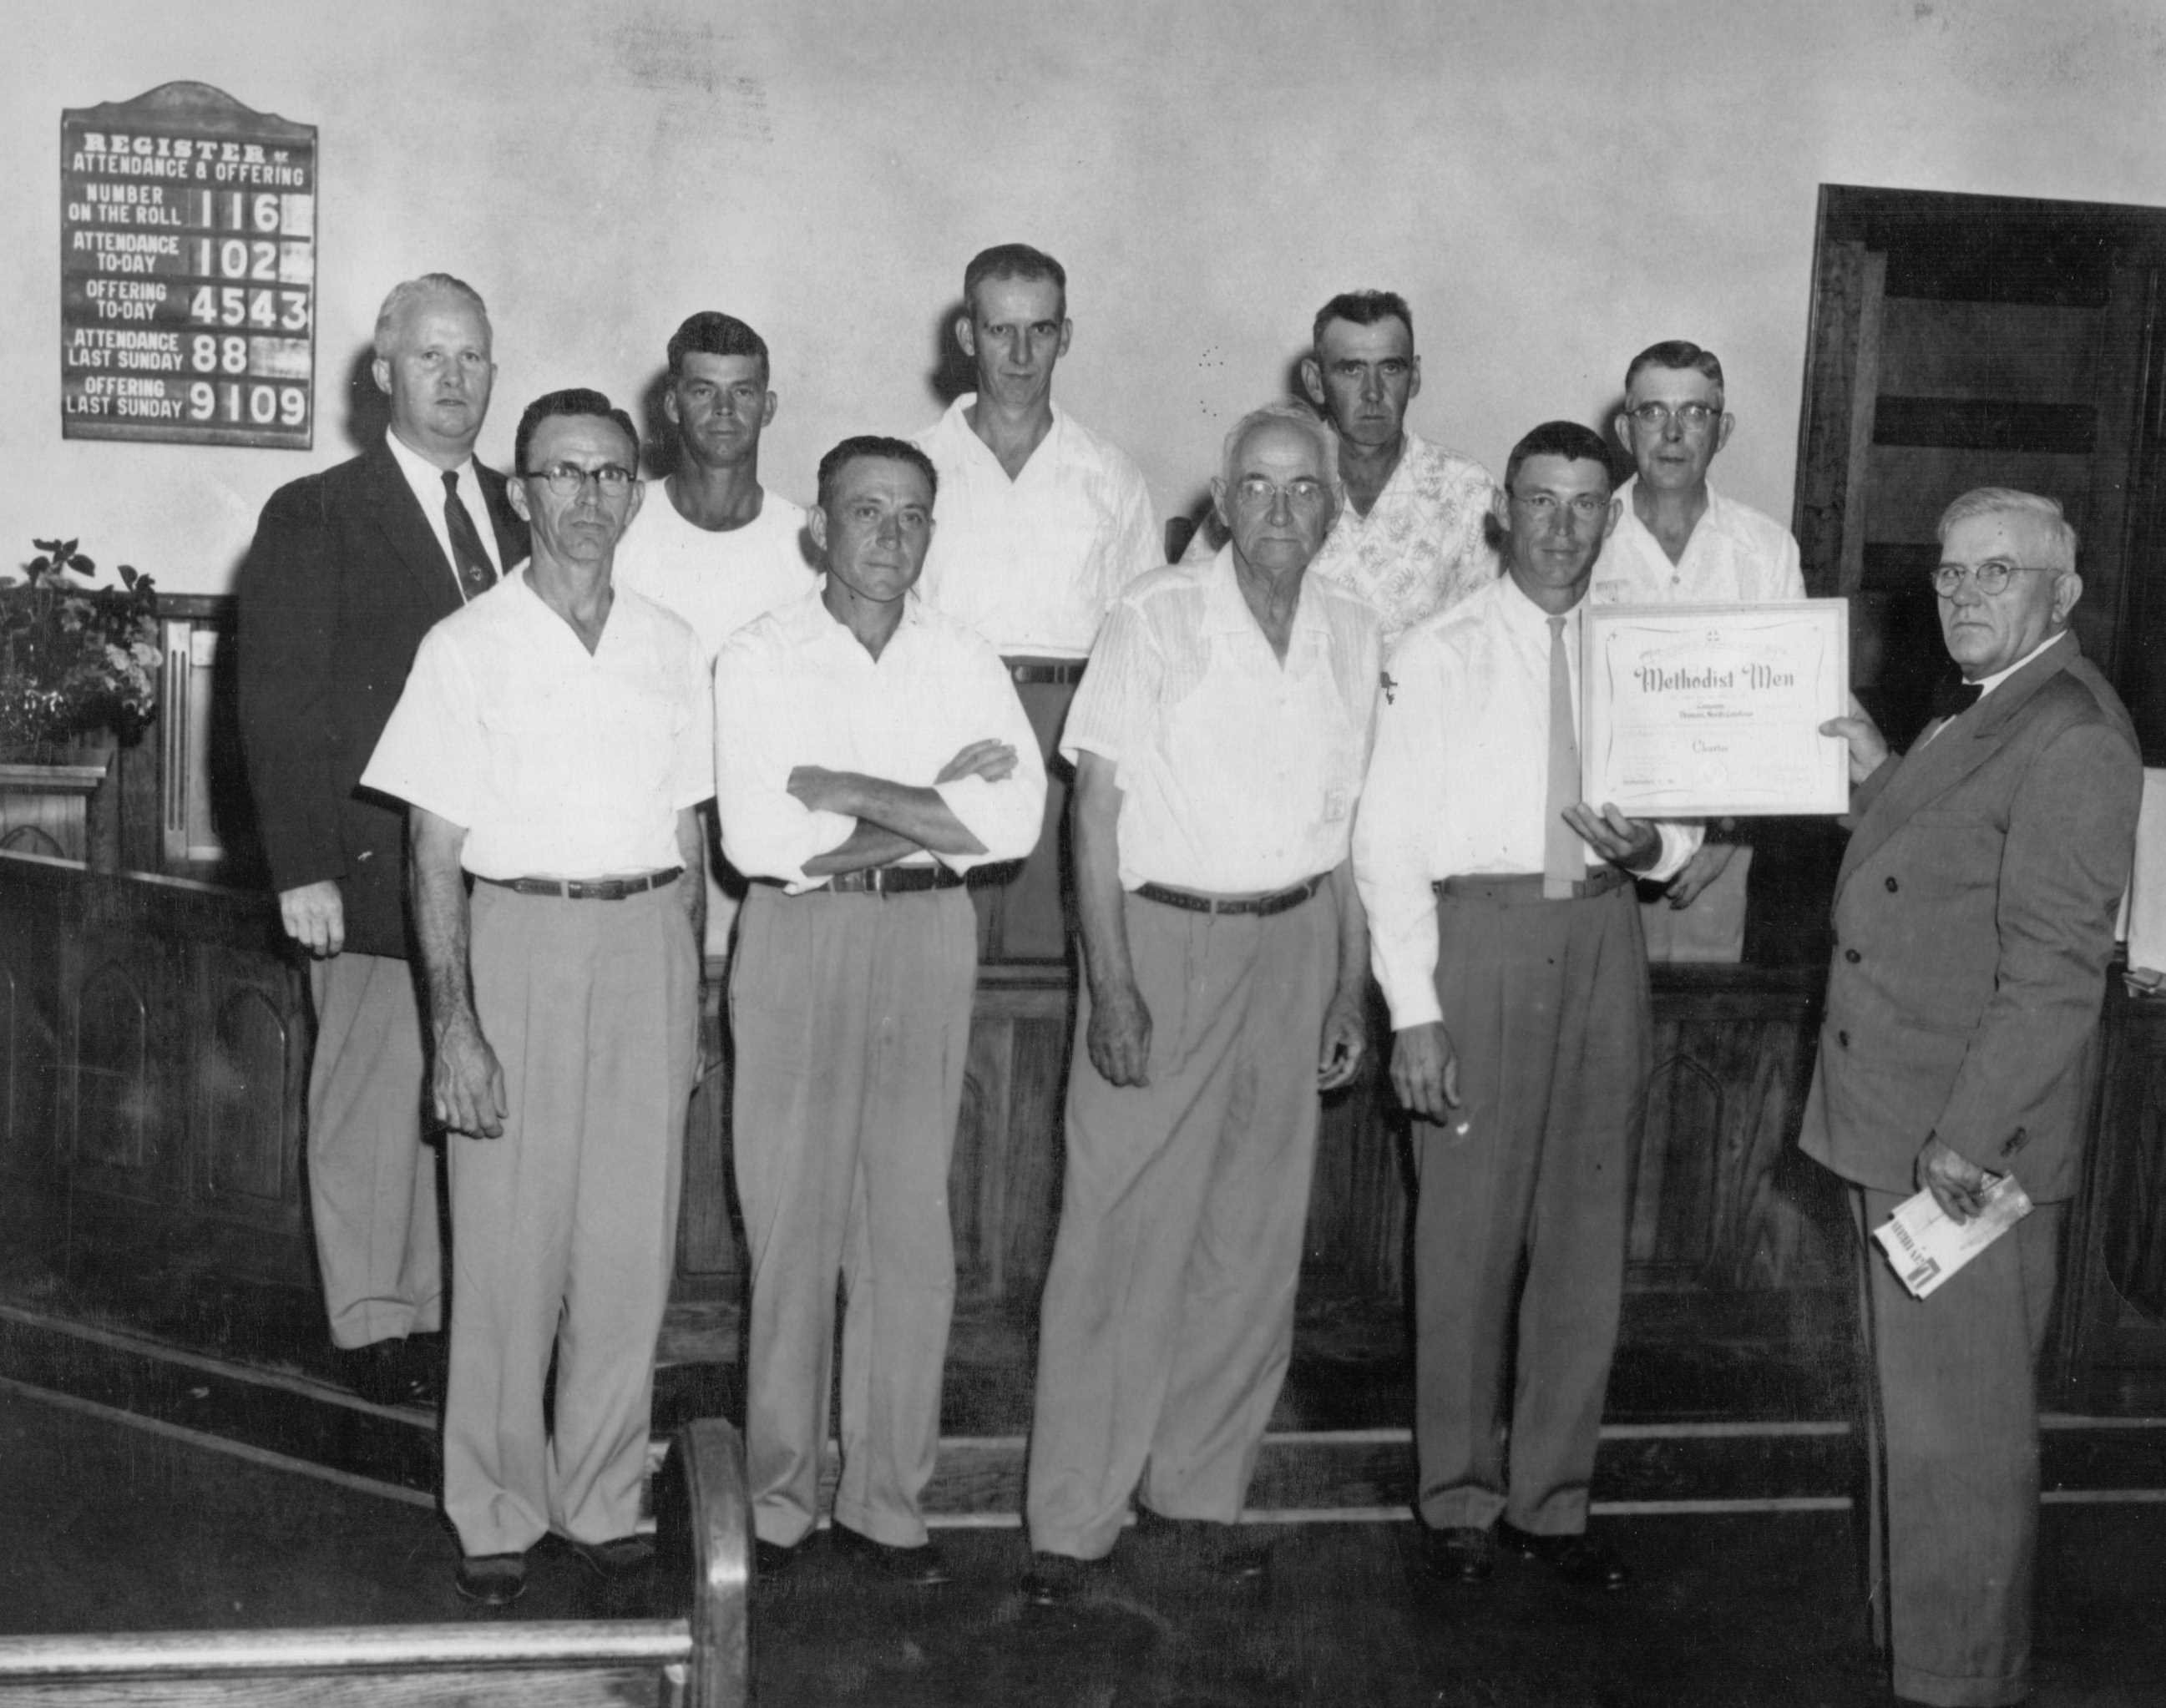 Photo: Canaan UMM - 1952-53 - Rev. Oakley, JB Nance, Wayne Kindley, Lee Surratt, Walter Martin, Ben Martin, Lee Loflin, ? , Lester Nance, Sen. Brock - http://CanaanUMC.net